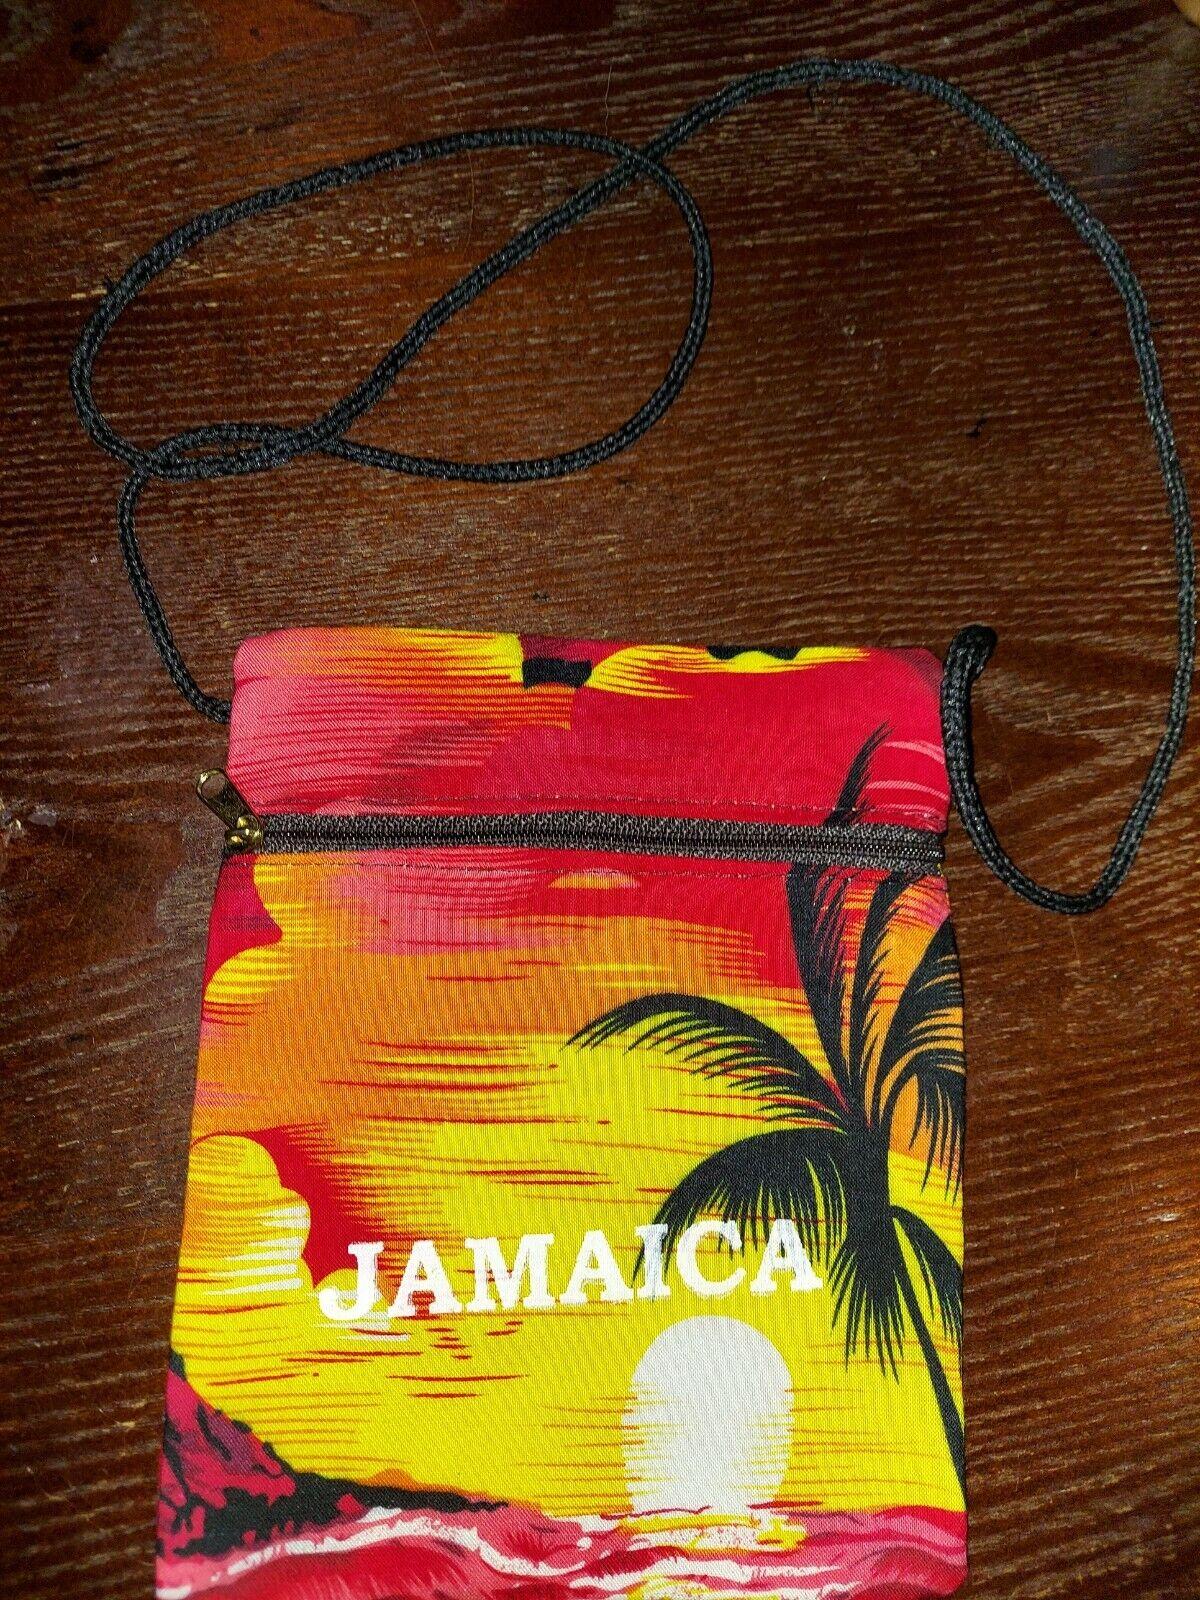 Small Purse Summer Scene Jamaica